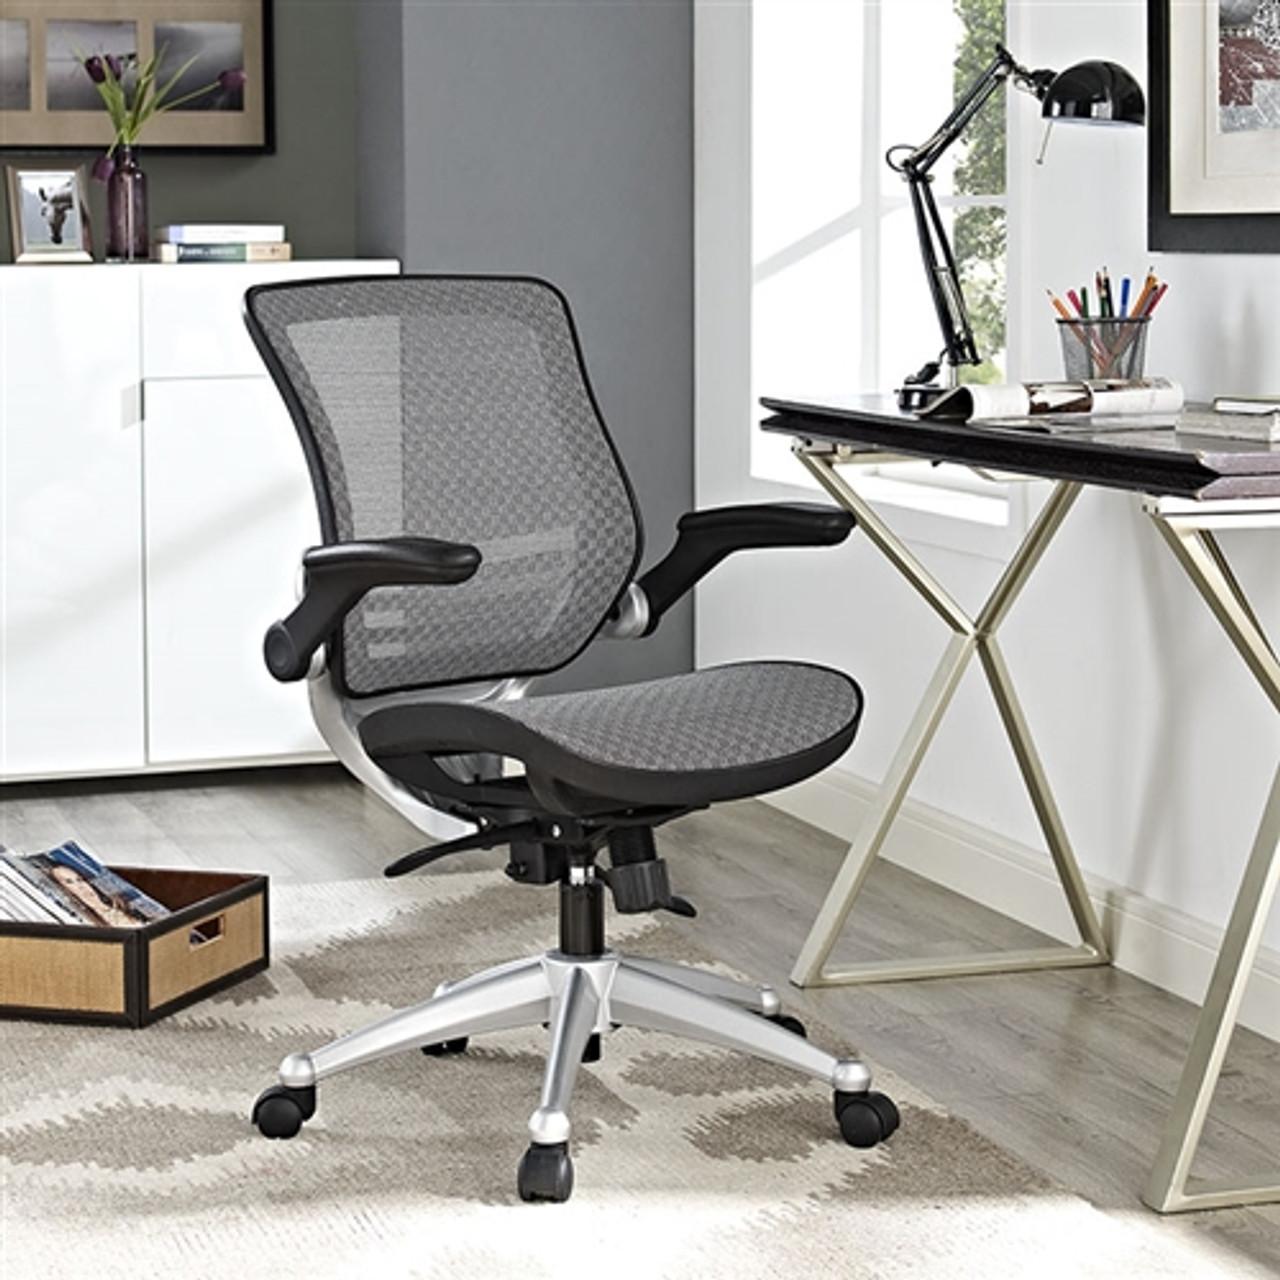 Modway Edge Eei 2064 All Mesh Office Chair